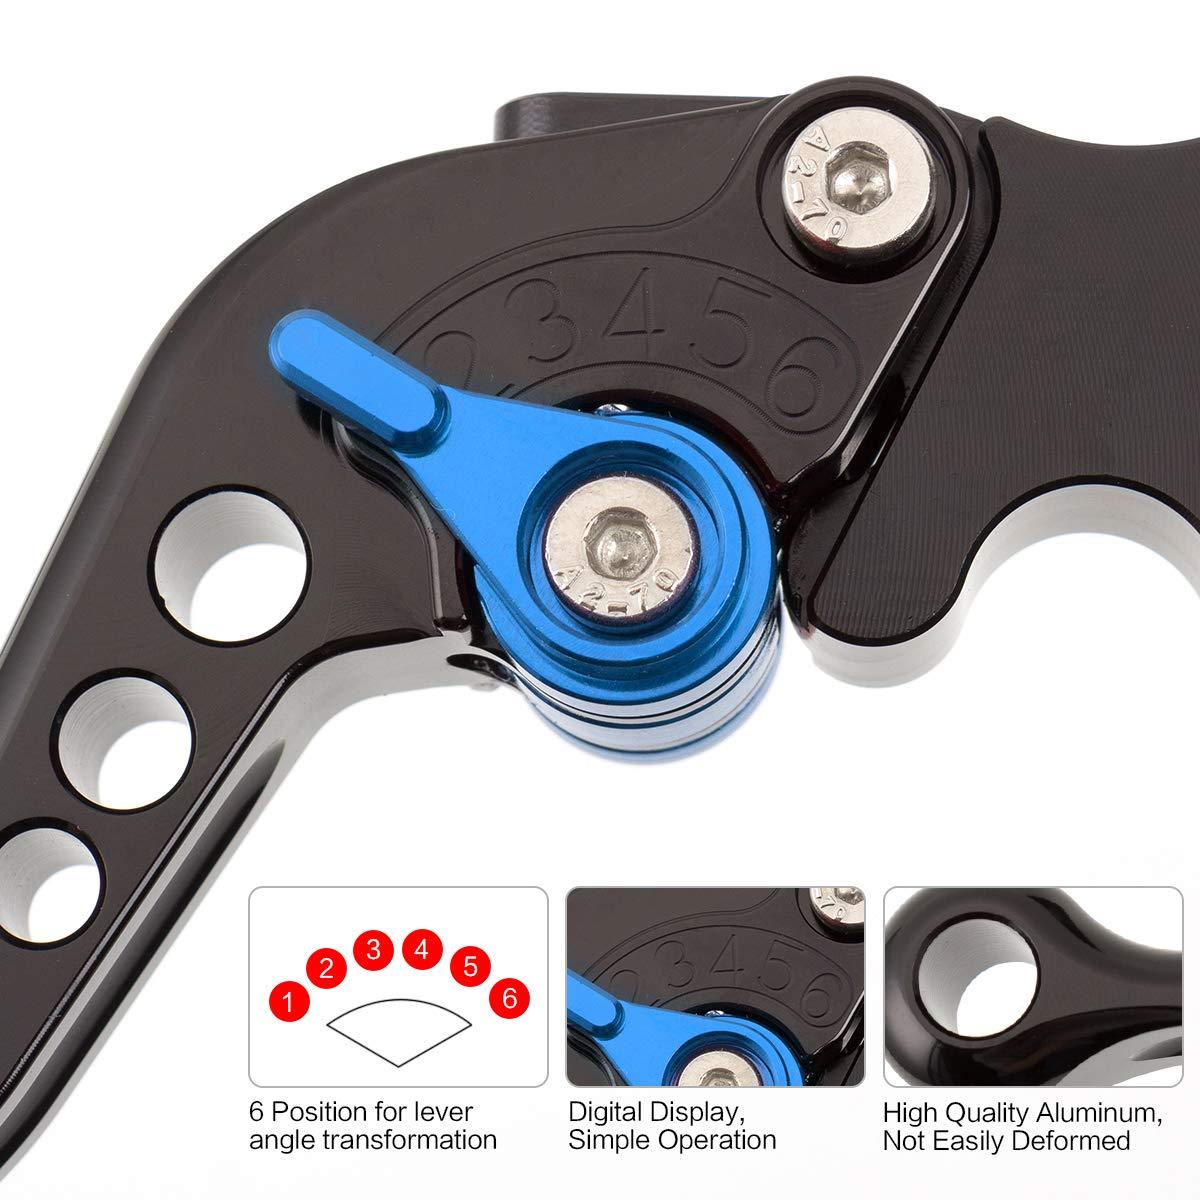 Palancas de embrague de freno corto de motocicleta CNC 6 posiciones ajustables para Yamaha Warrior YFM 350 YFM350 2002-2004 Raptor YFM660 2001-2004 Oro con negro XT660 XT660R XT660X 2004-2013